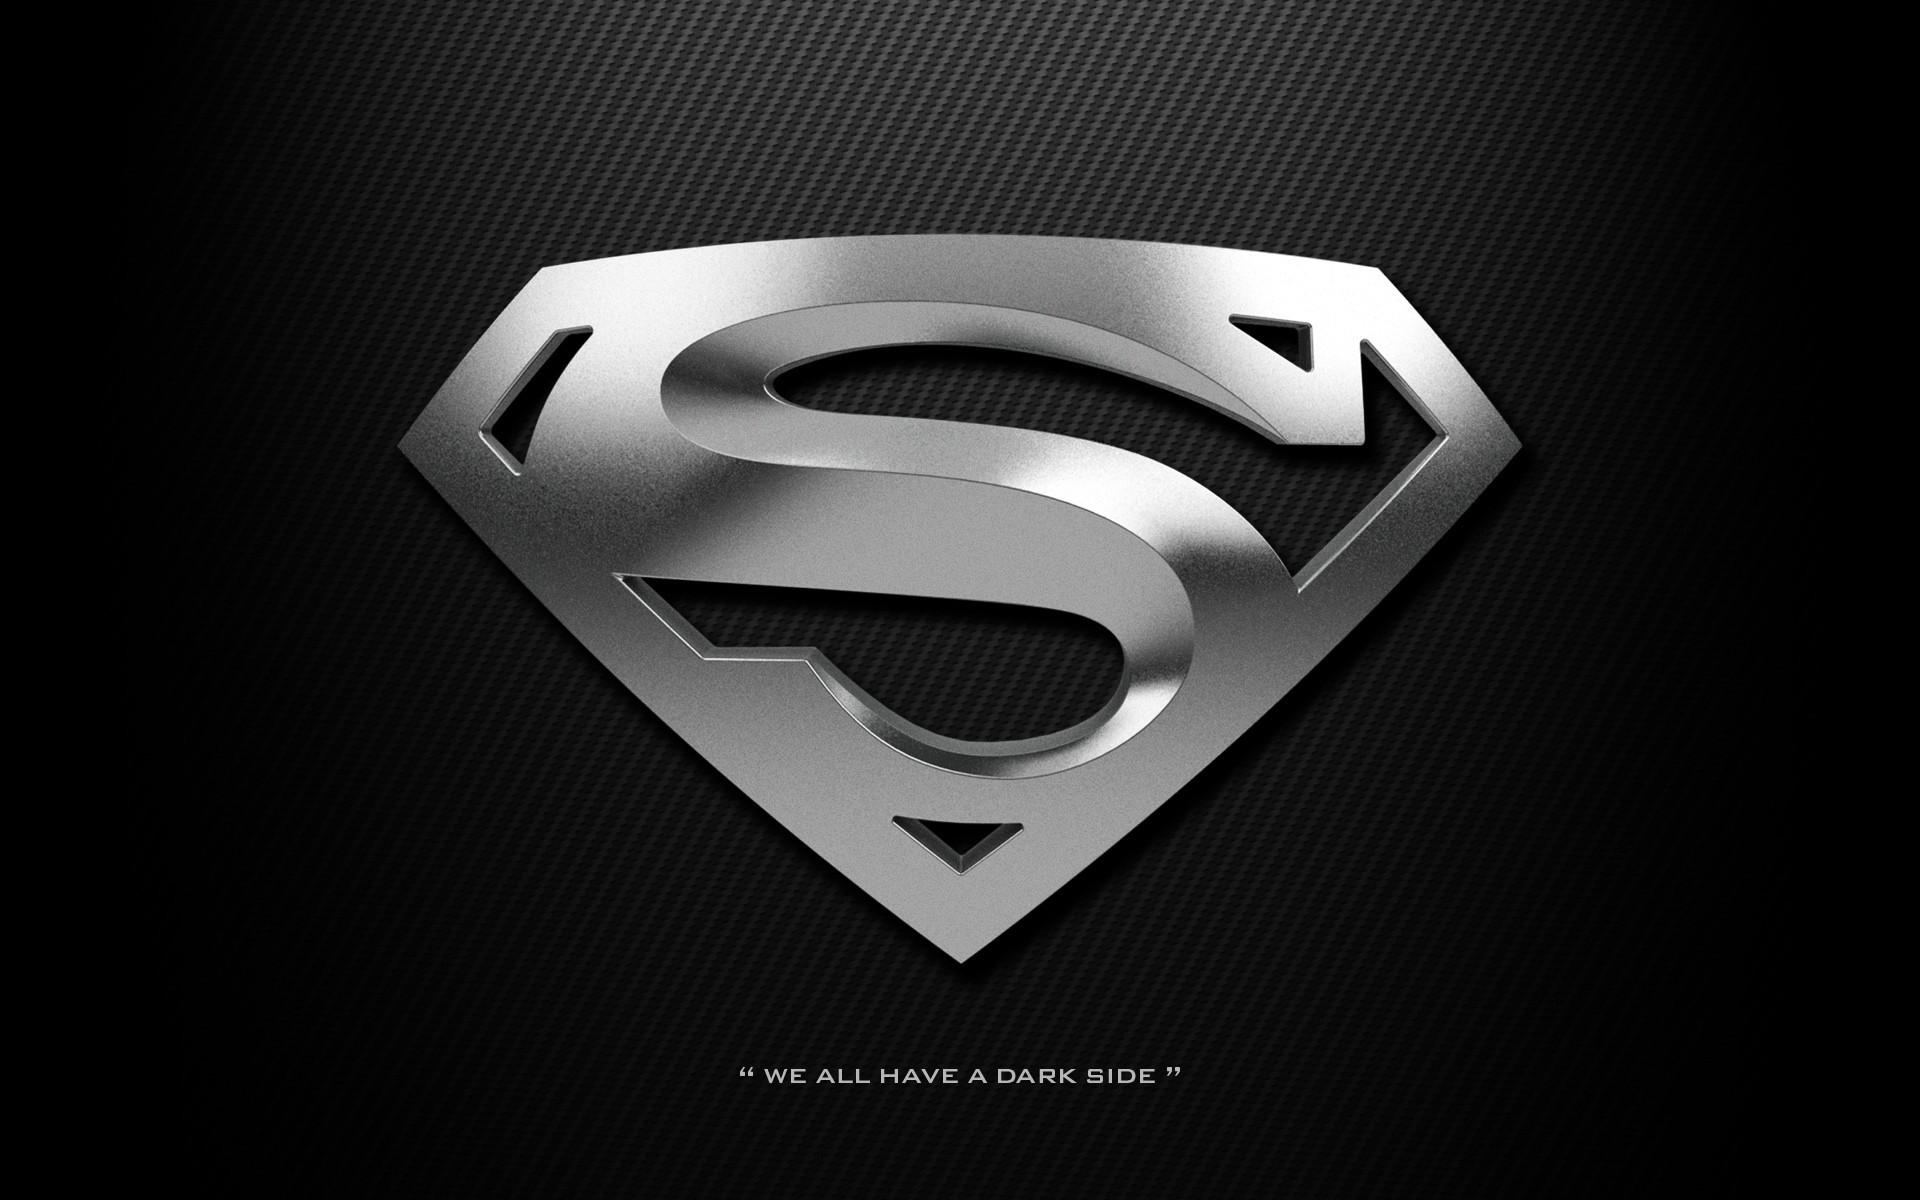 Superman Logo Wallpaper Download Free Amazing High Resolution